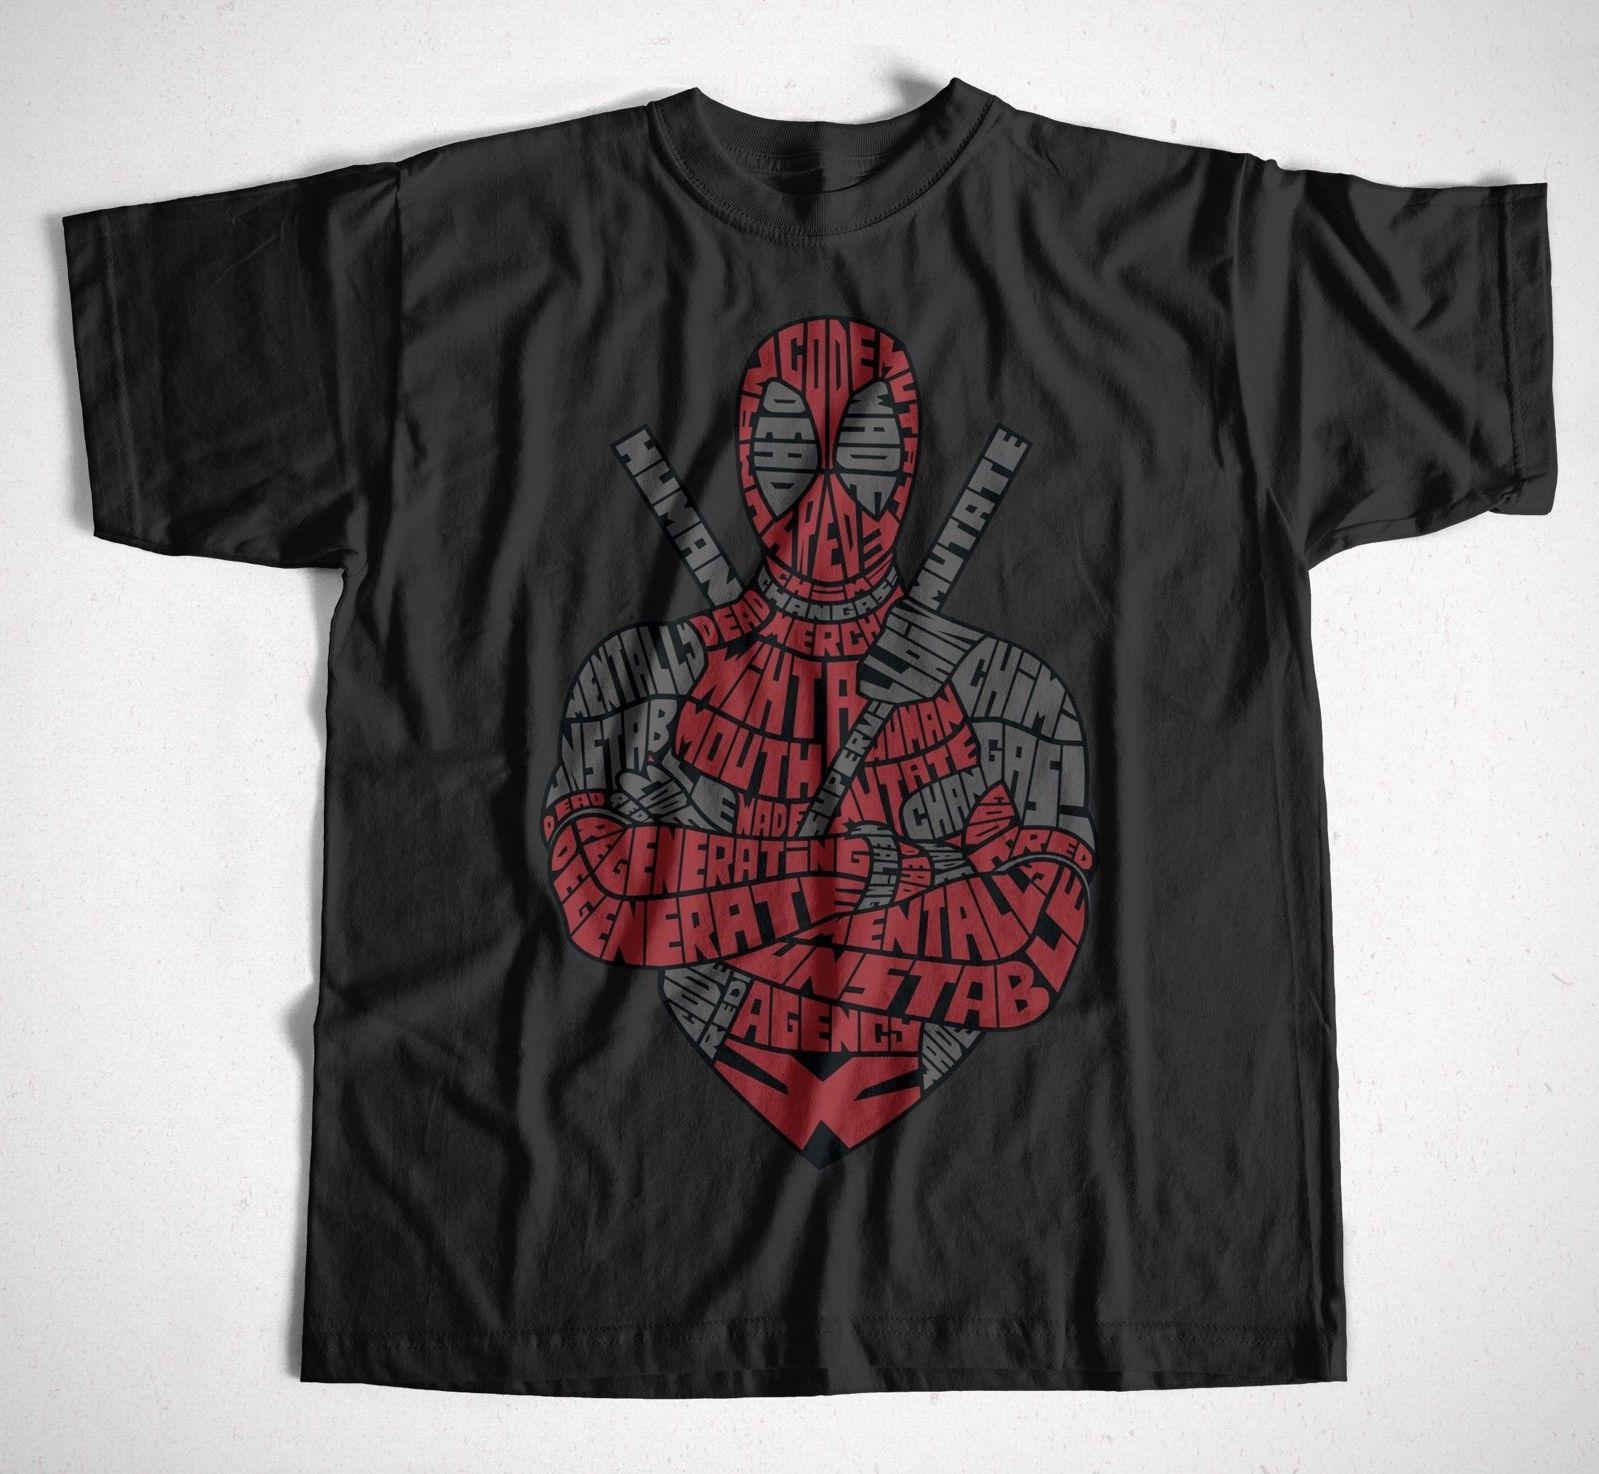 t-shirt-dead-red-s-xxxl-spiderman-deadpool-marvel-font-b-tarantino-b-font-anti-hero-quentin-t-shirt-men-short-sleeve-t-shirt